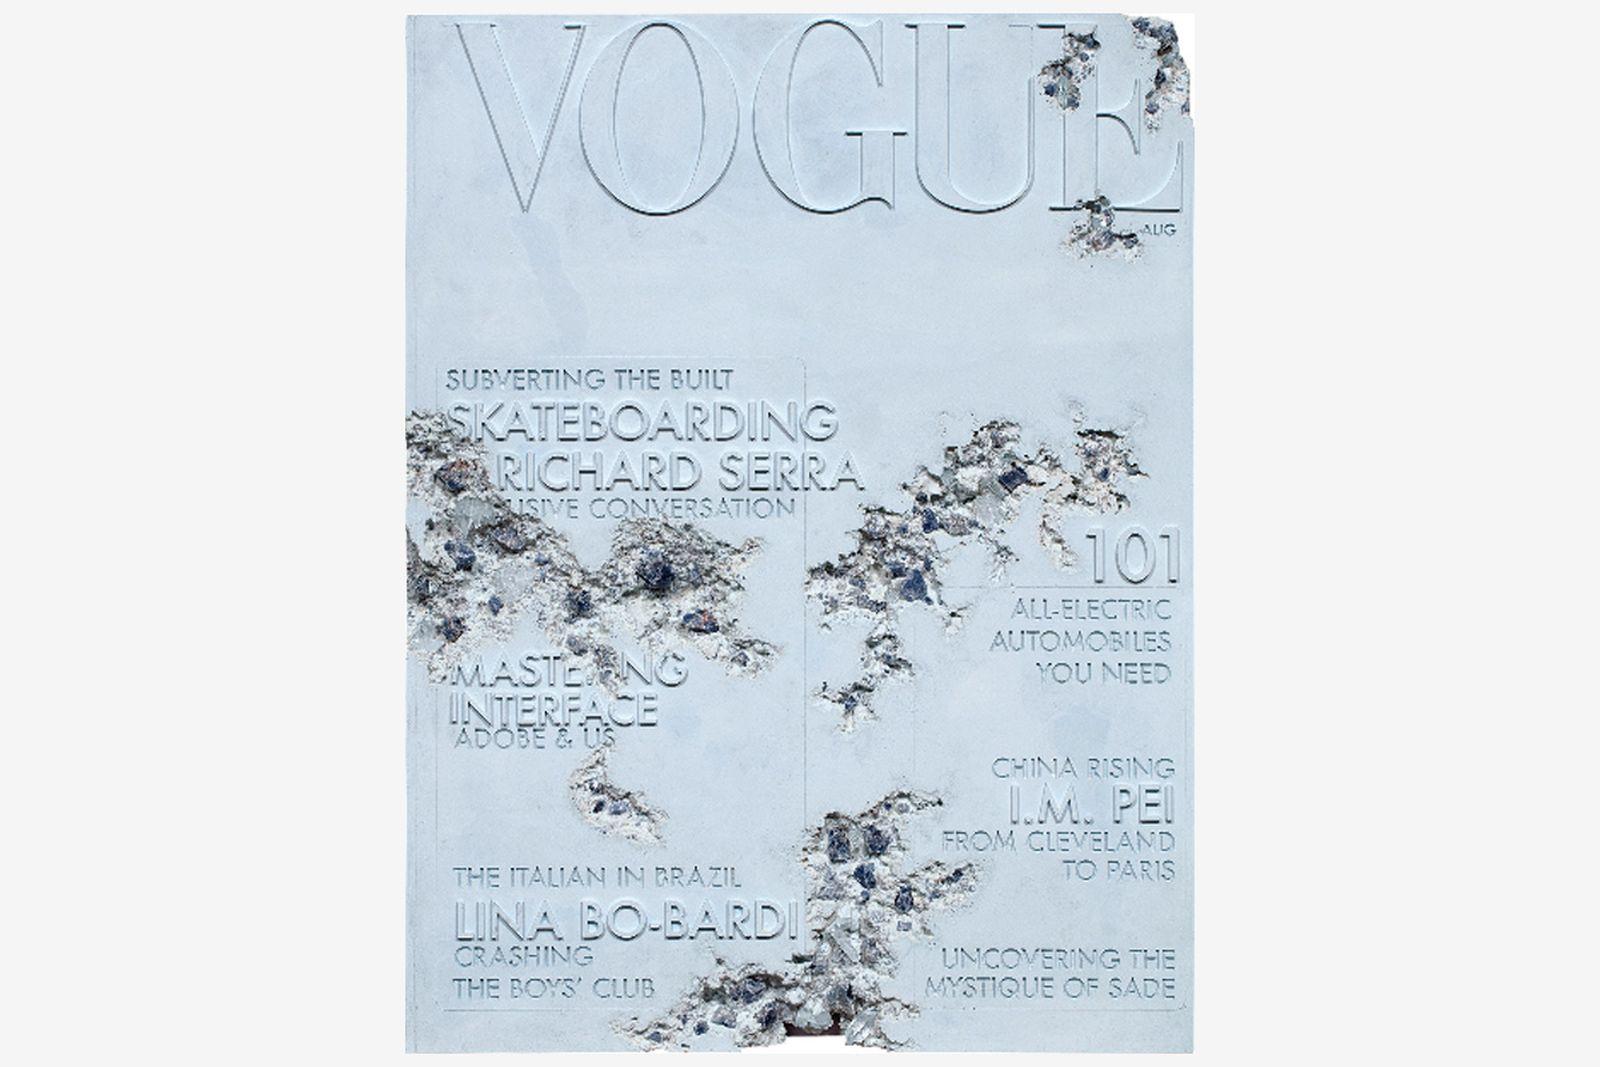 daniel-arsham-quartz-eroded-vogue-magazine-101-auction-01